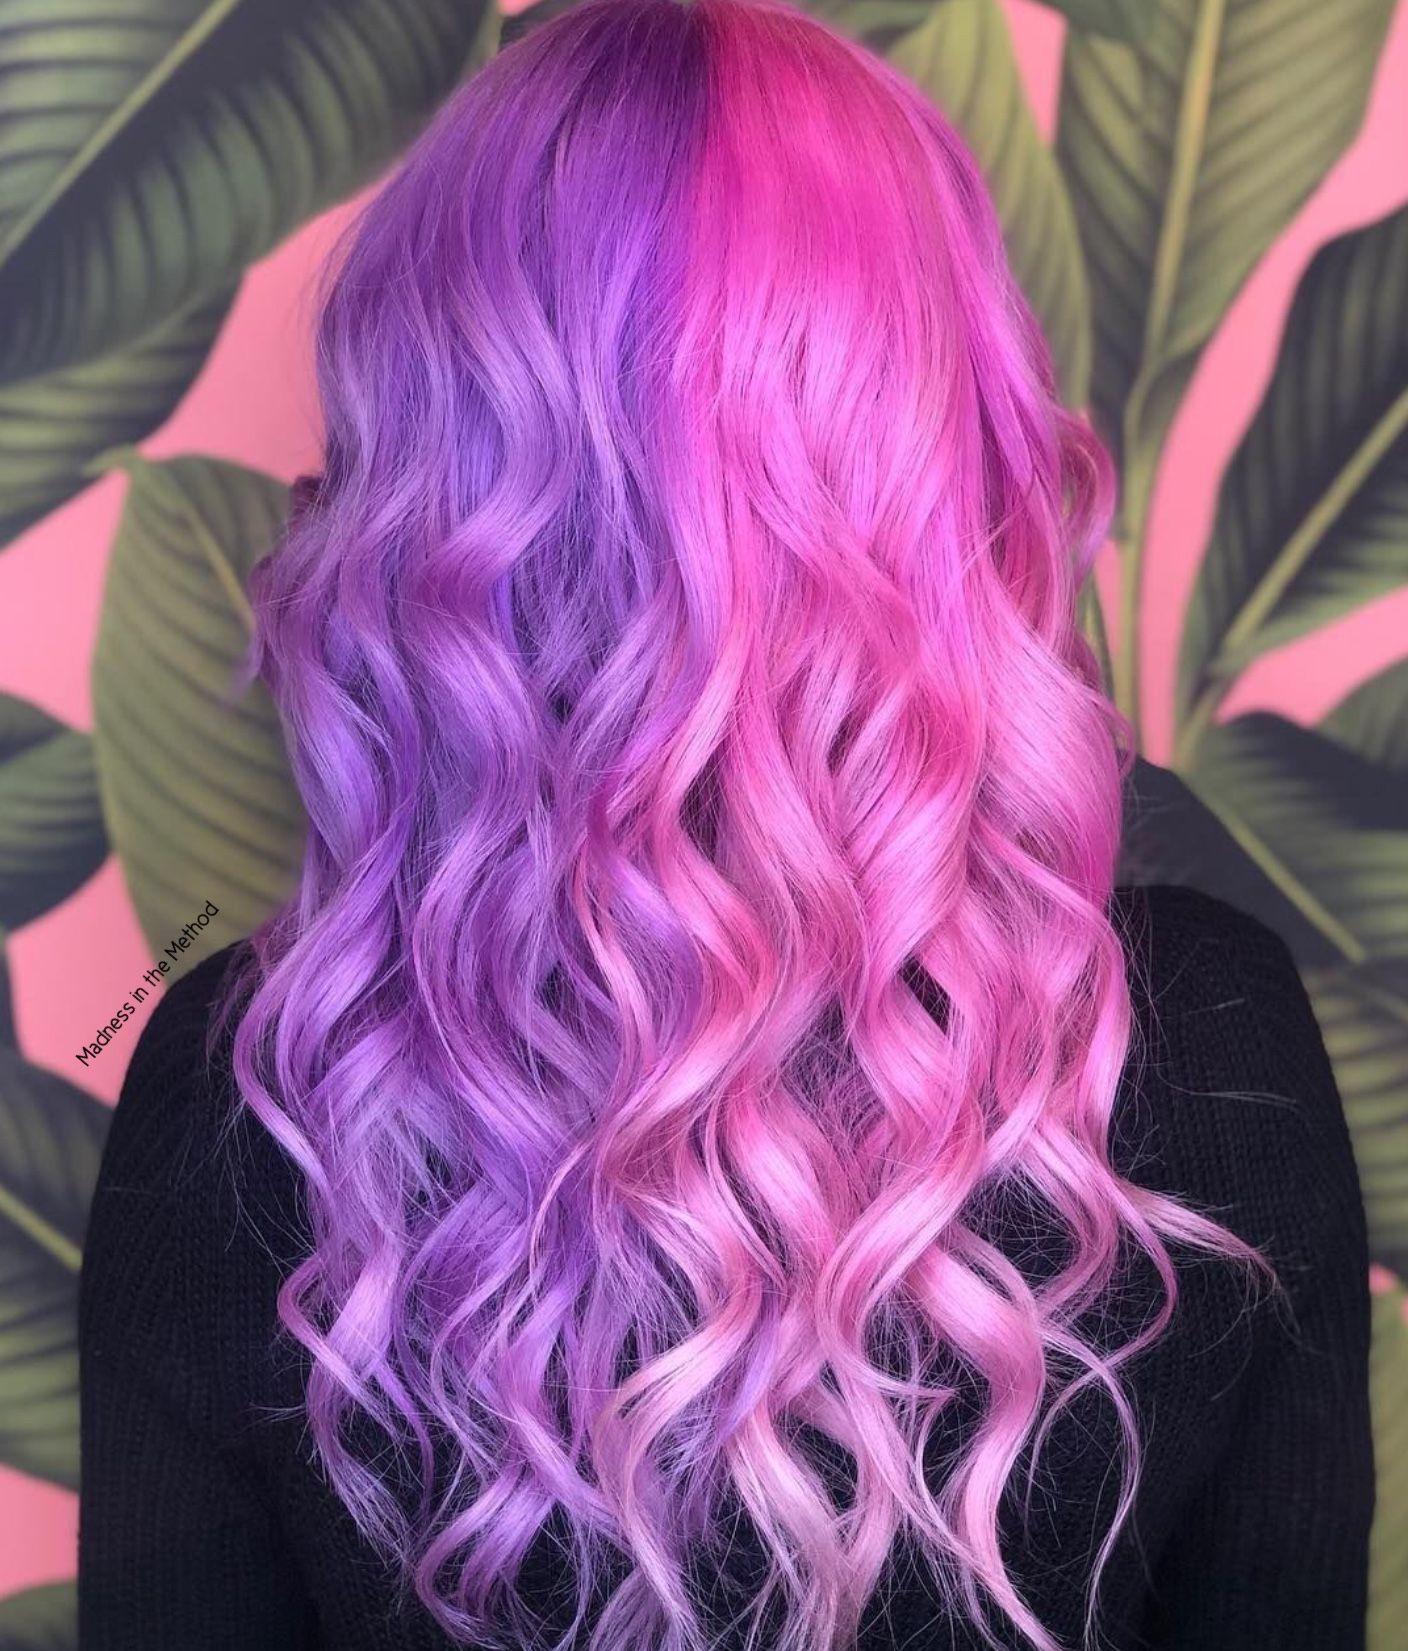 Pin By Storm Frost On Hairrrrrrrrrrr Guh In 2020 Hair Dye Colors Hair Color Pink Bright Hair